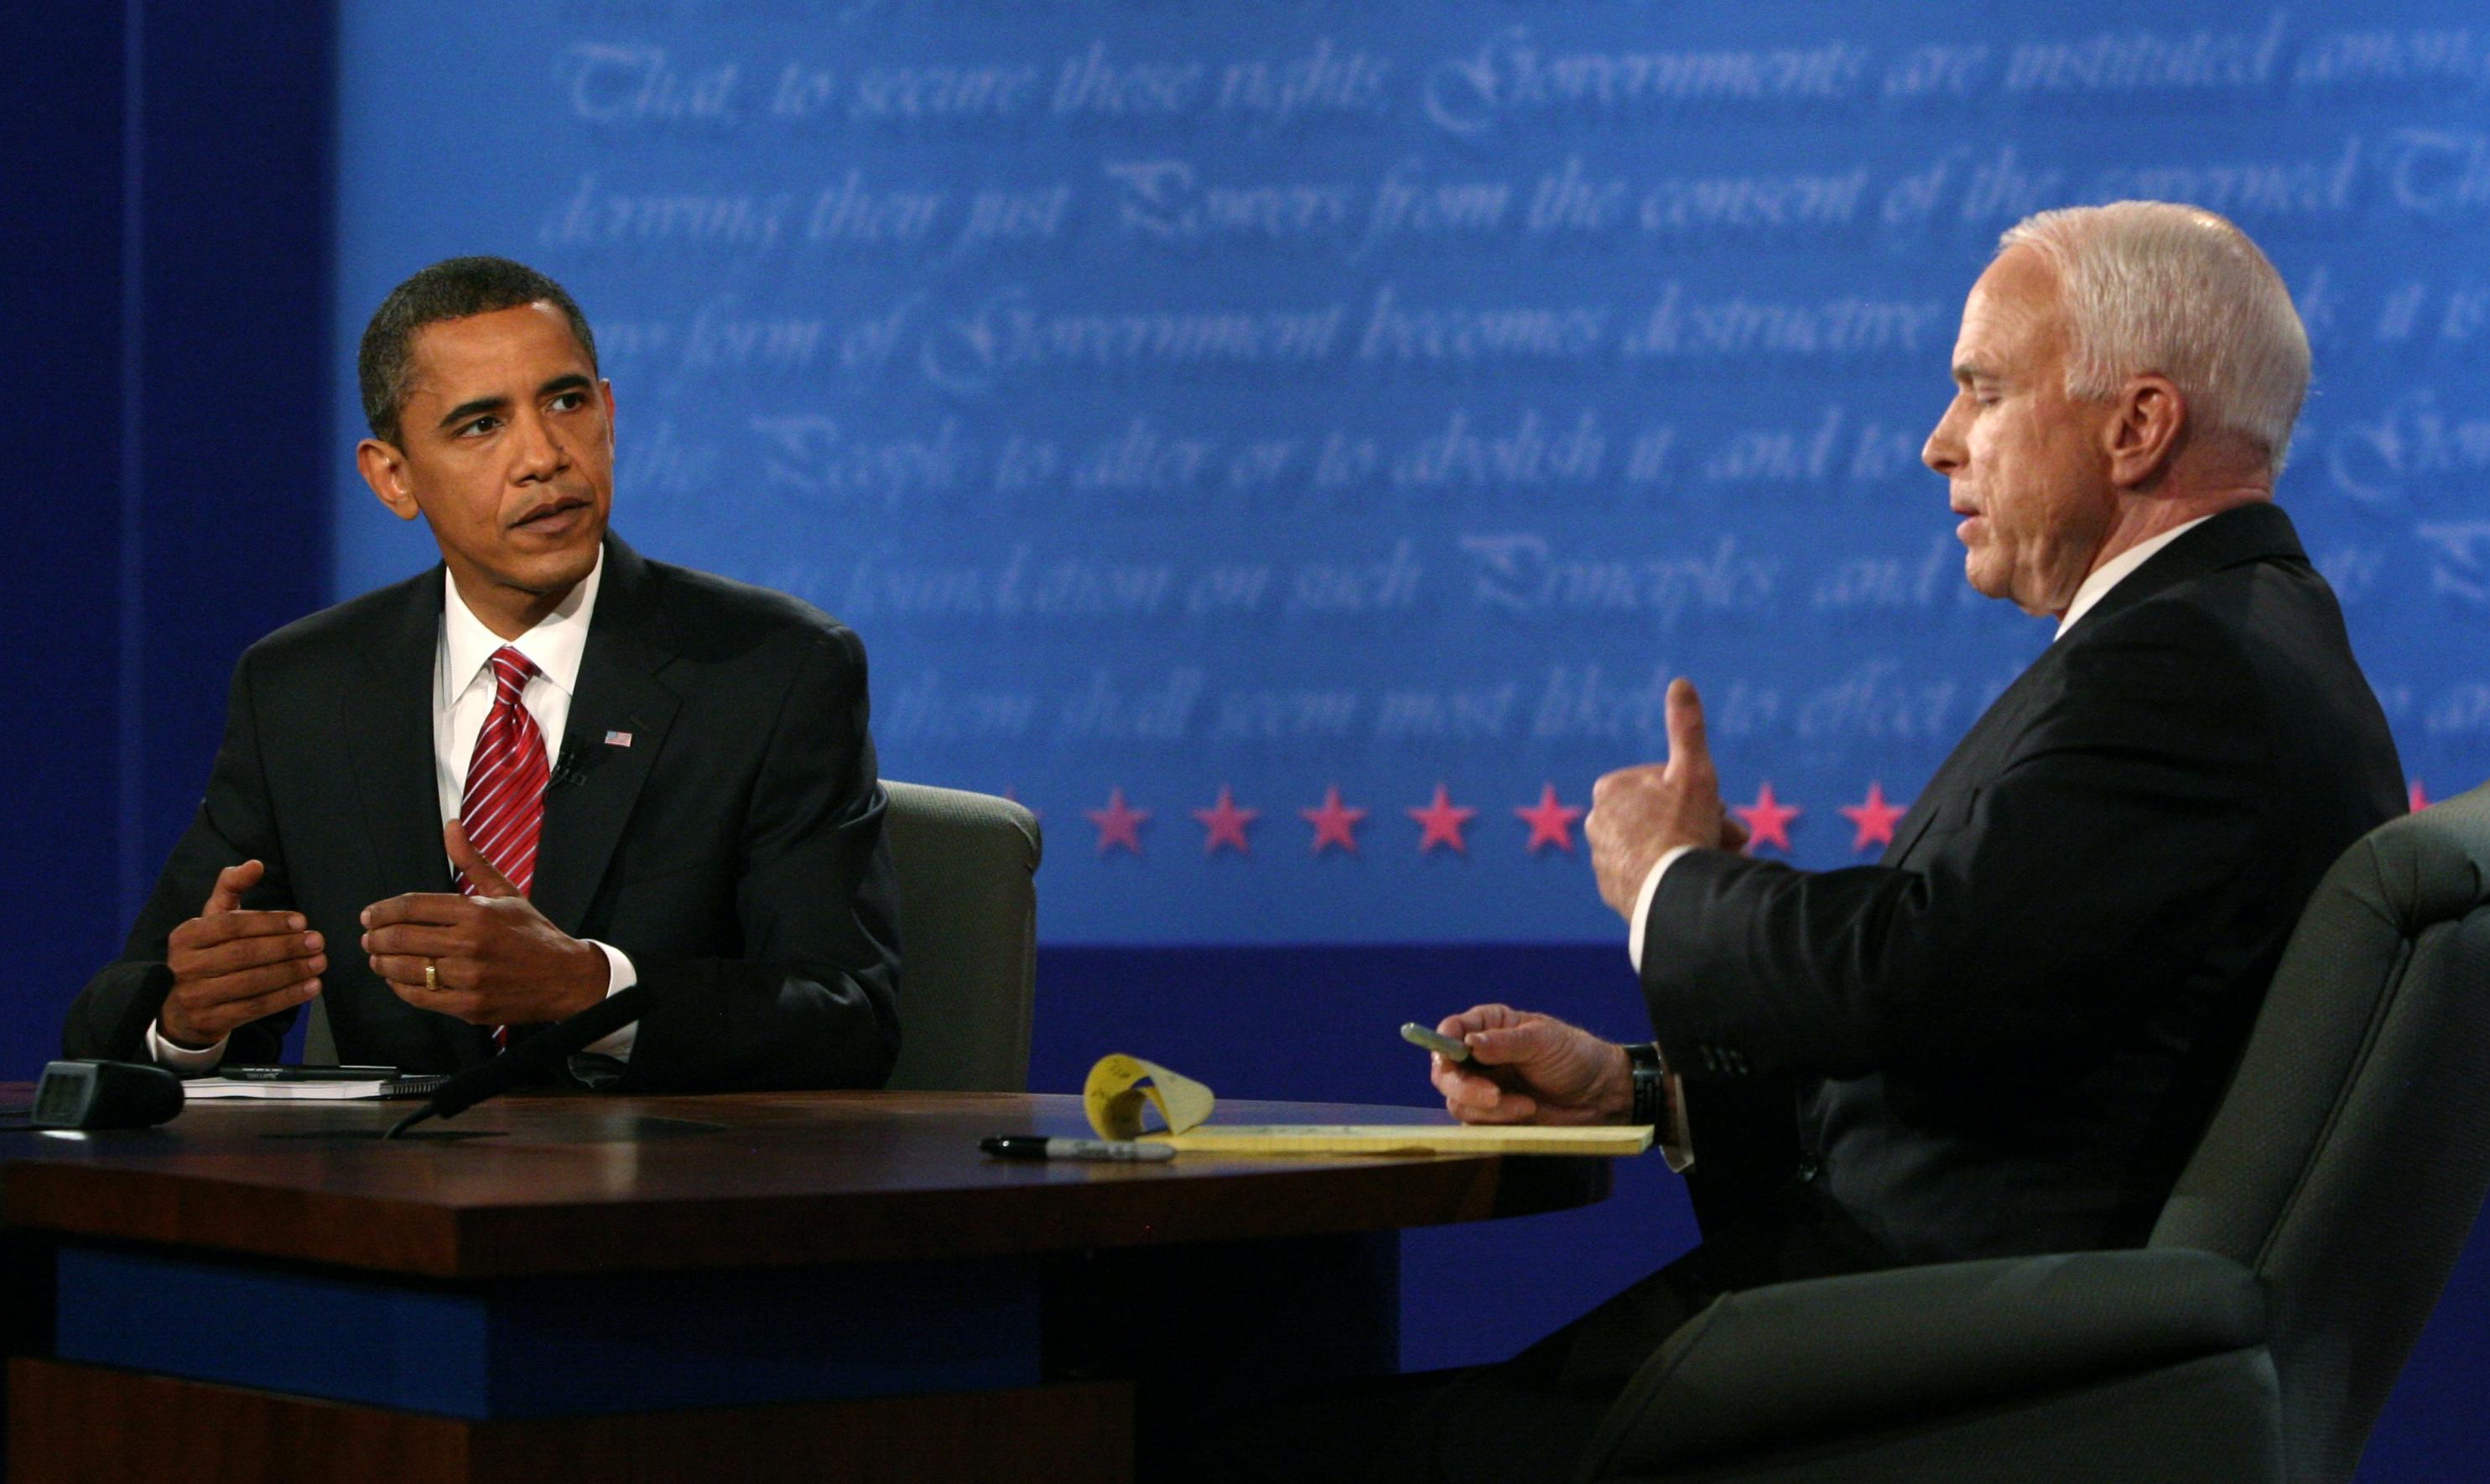 McCain vs. Obama: The third 2008 presidential debate